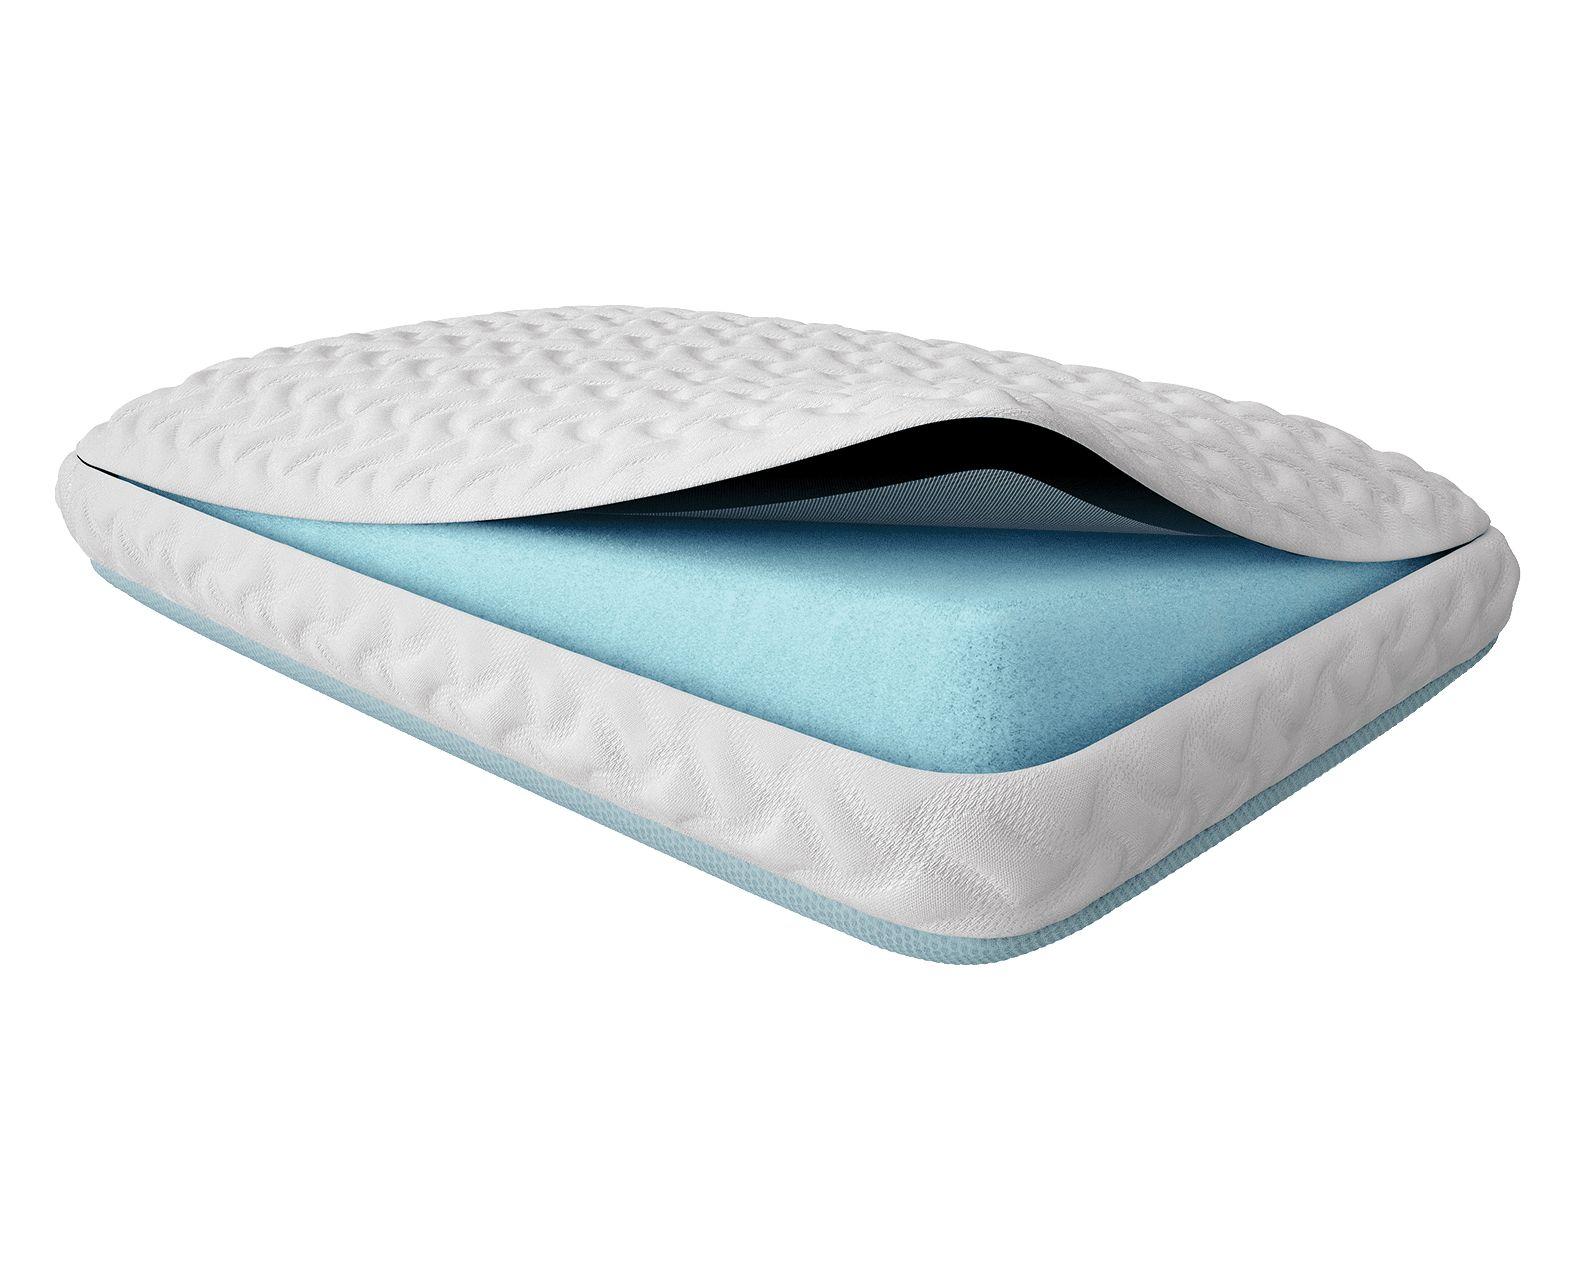 TEMPUR-Adapt® Cloud+Cooling pillow